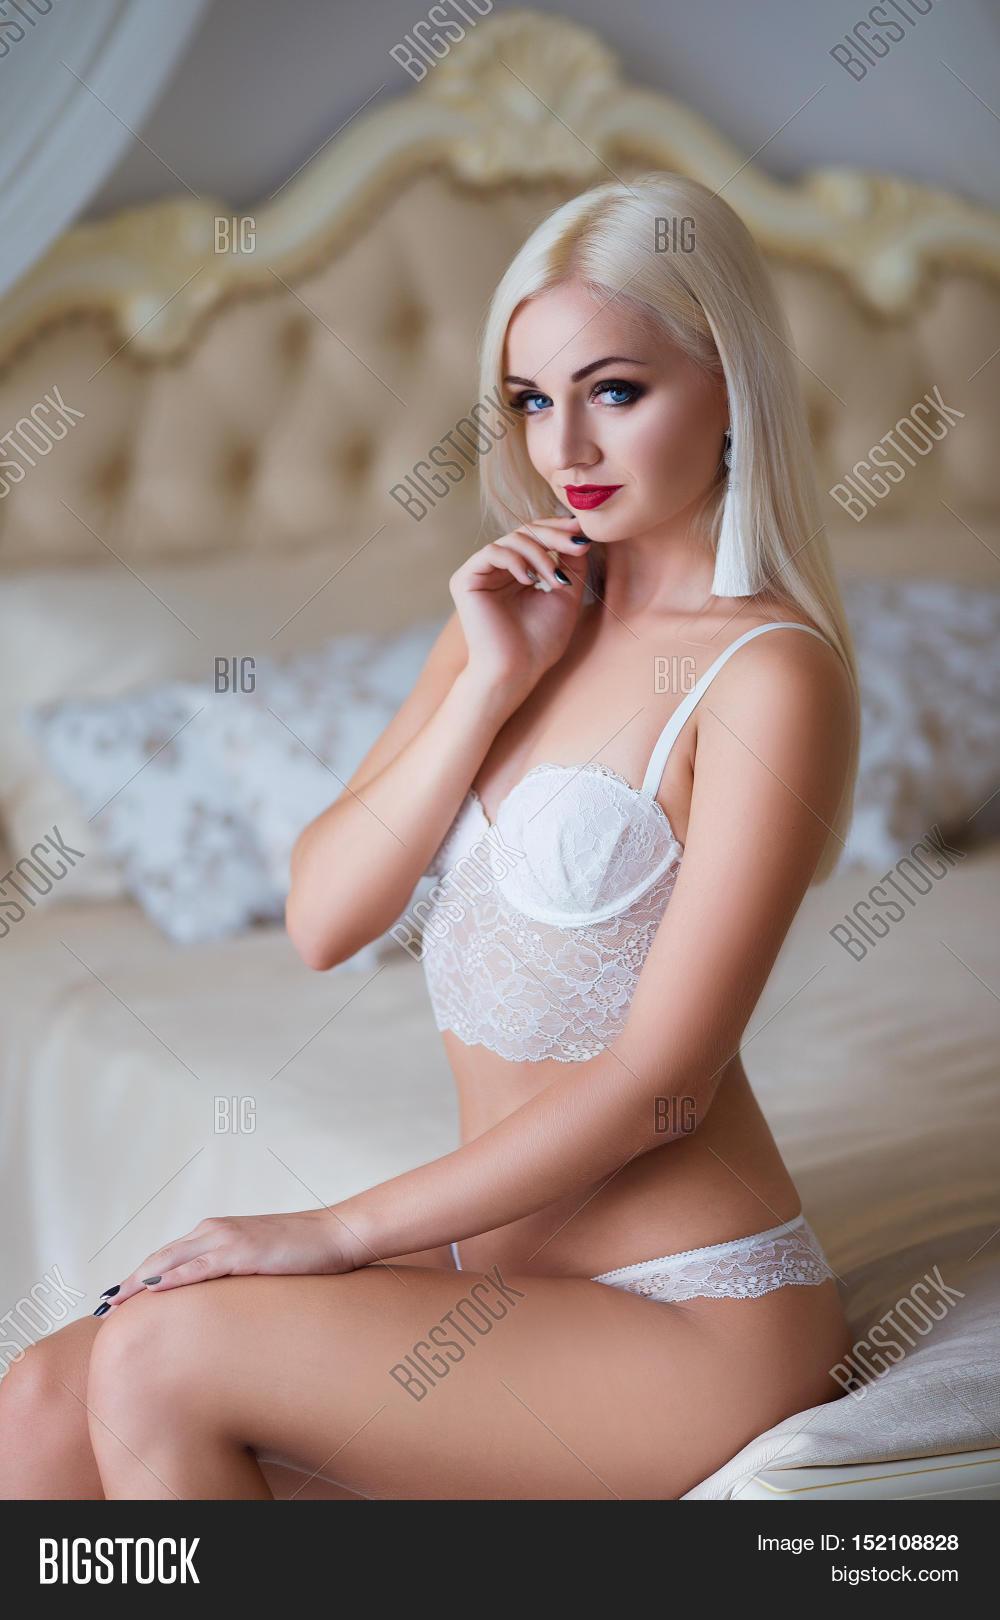 Miranda jordan naked for playboy